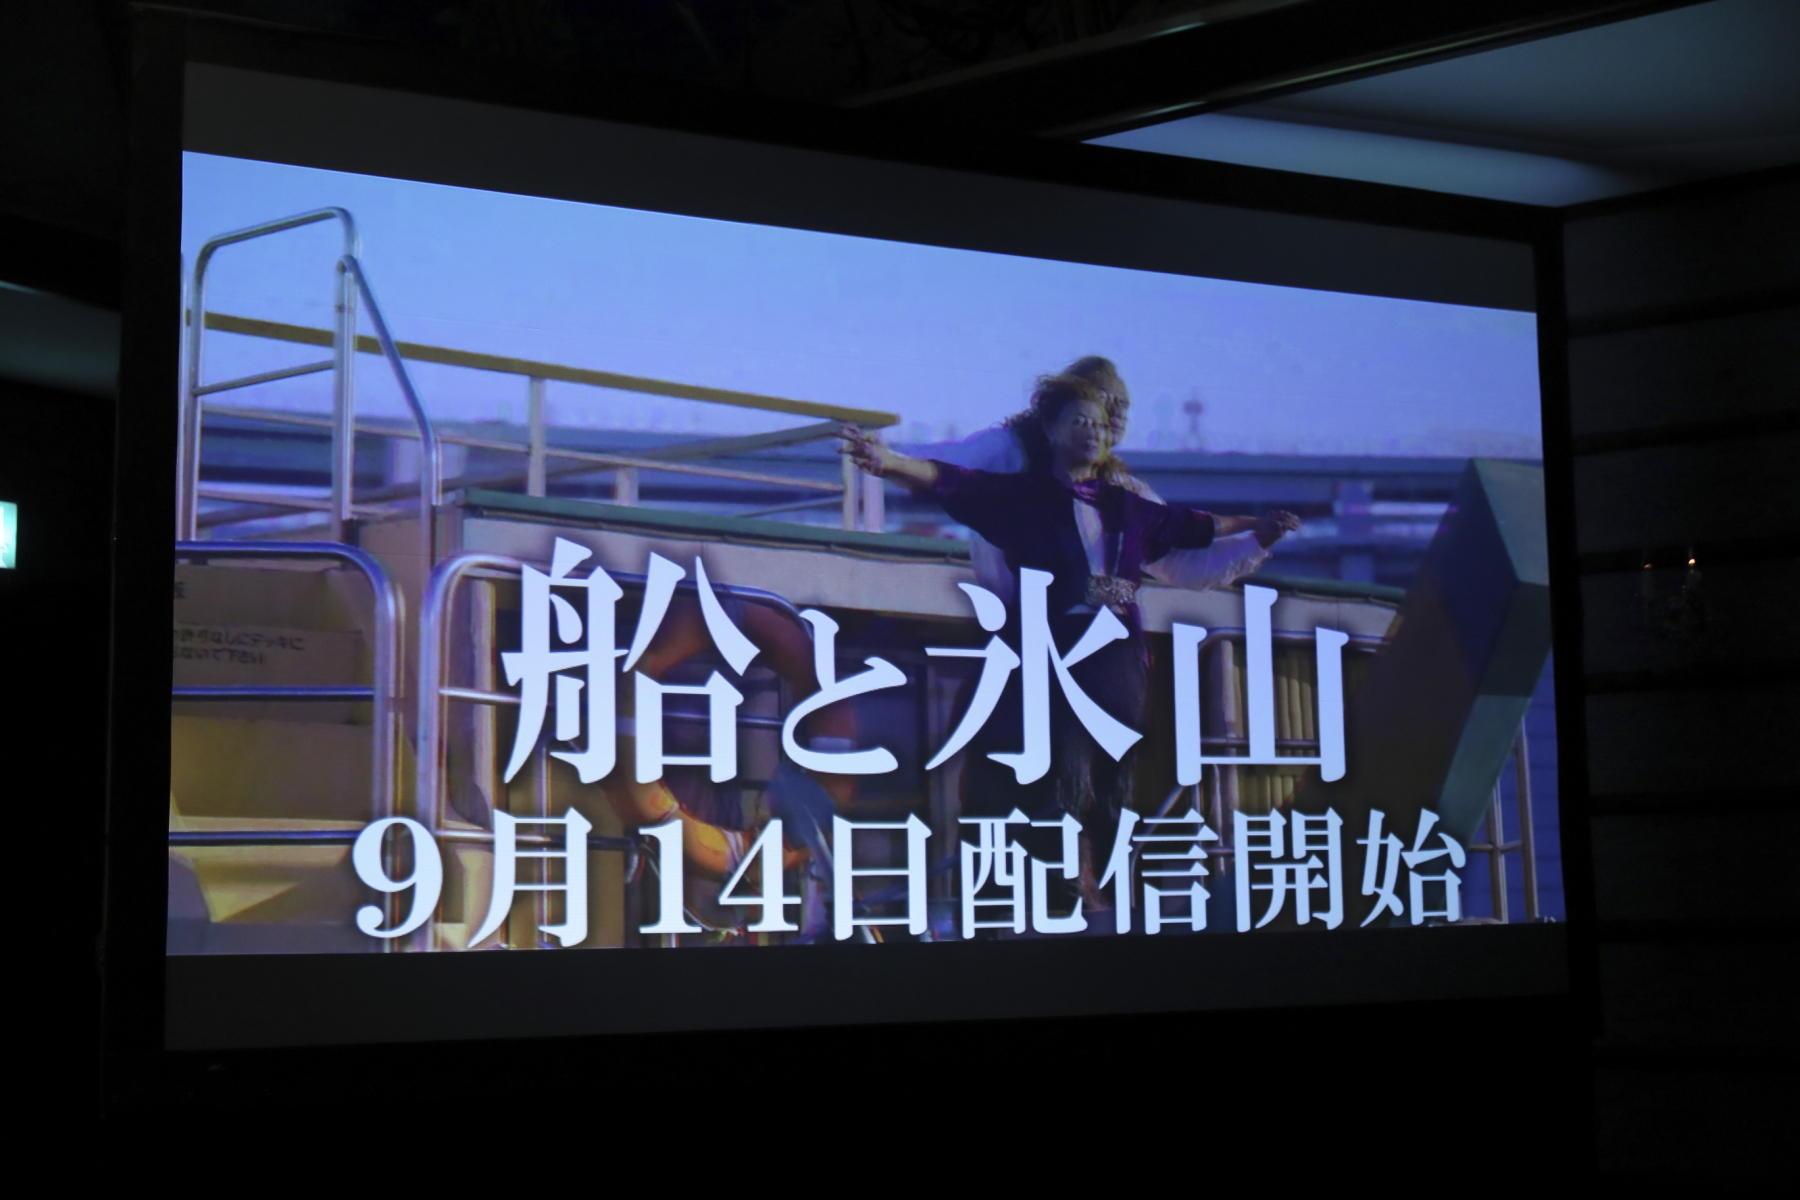 http://news.yoshimoto.co.jp/20180831163411-d4cfbdf19cfd34d4b0d15d448032c97c191a3941.jpg